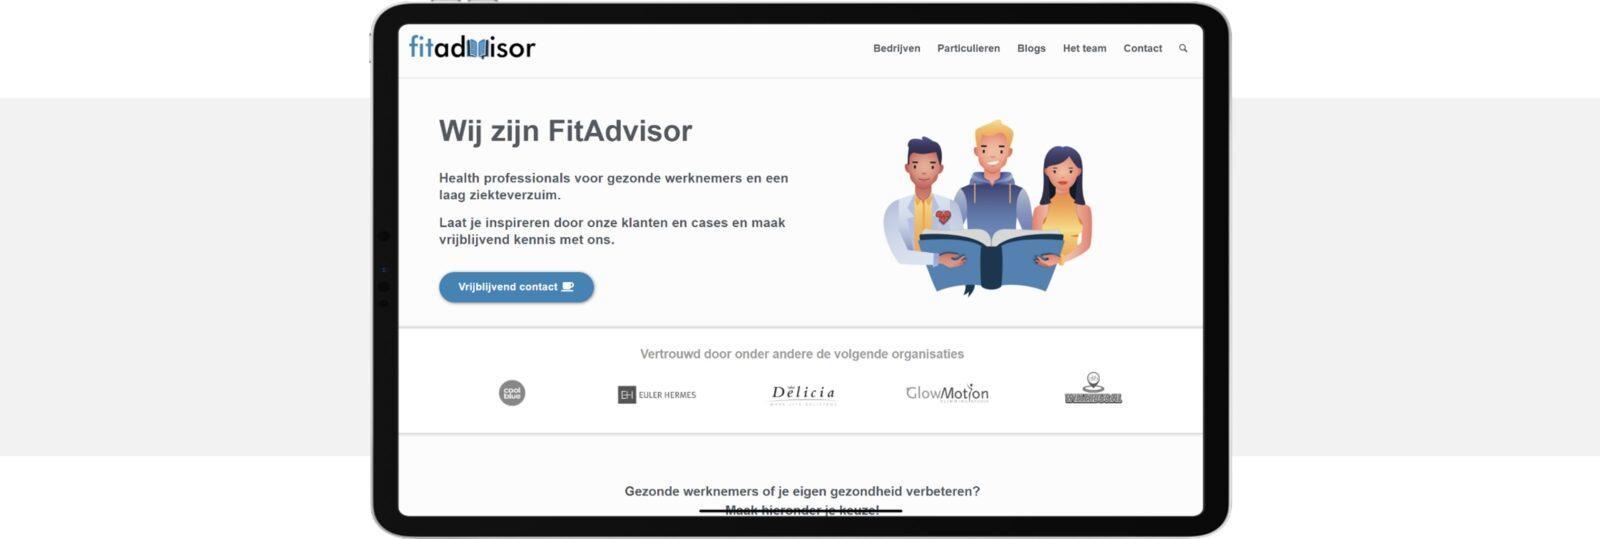 fitadvisor home